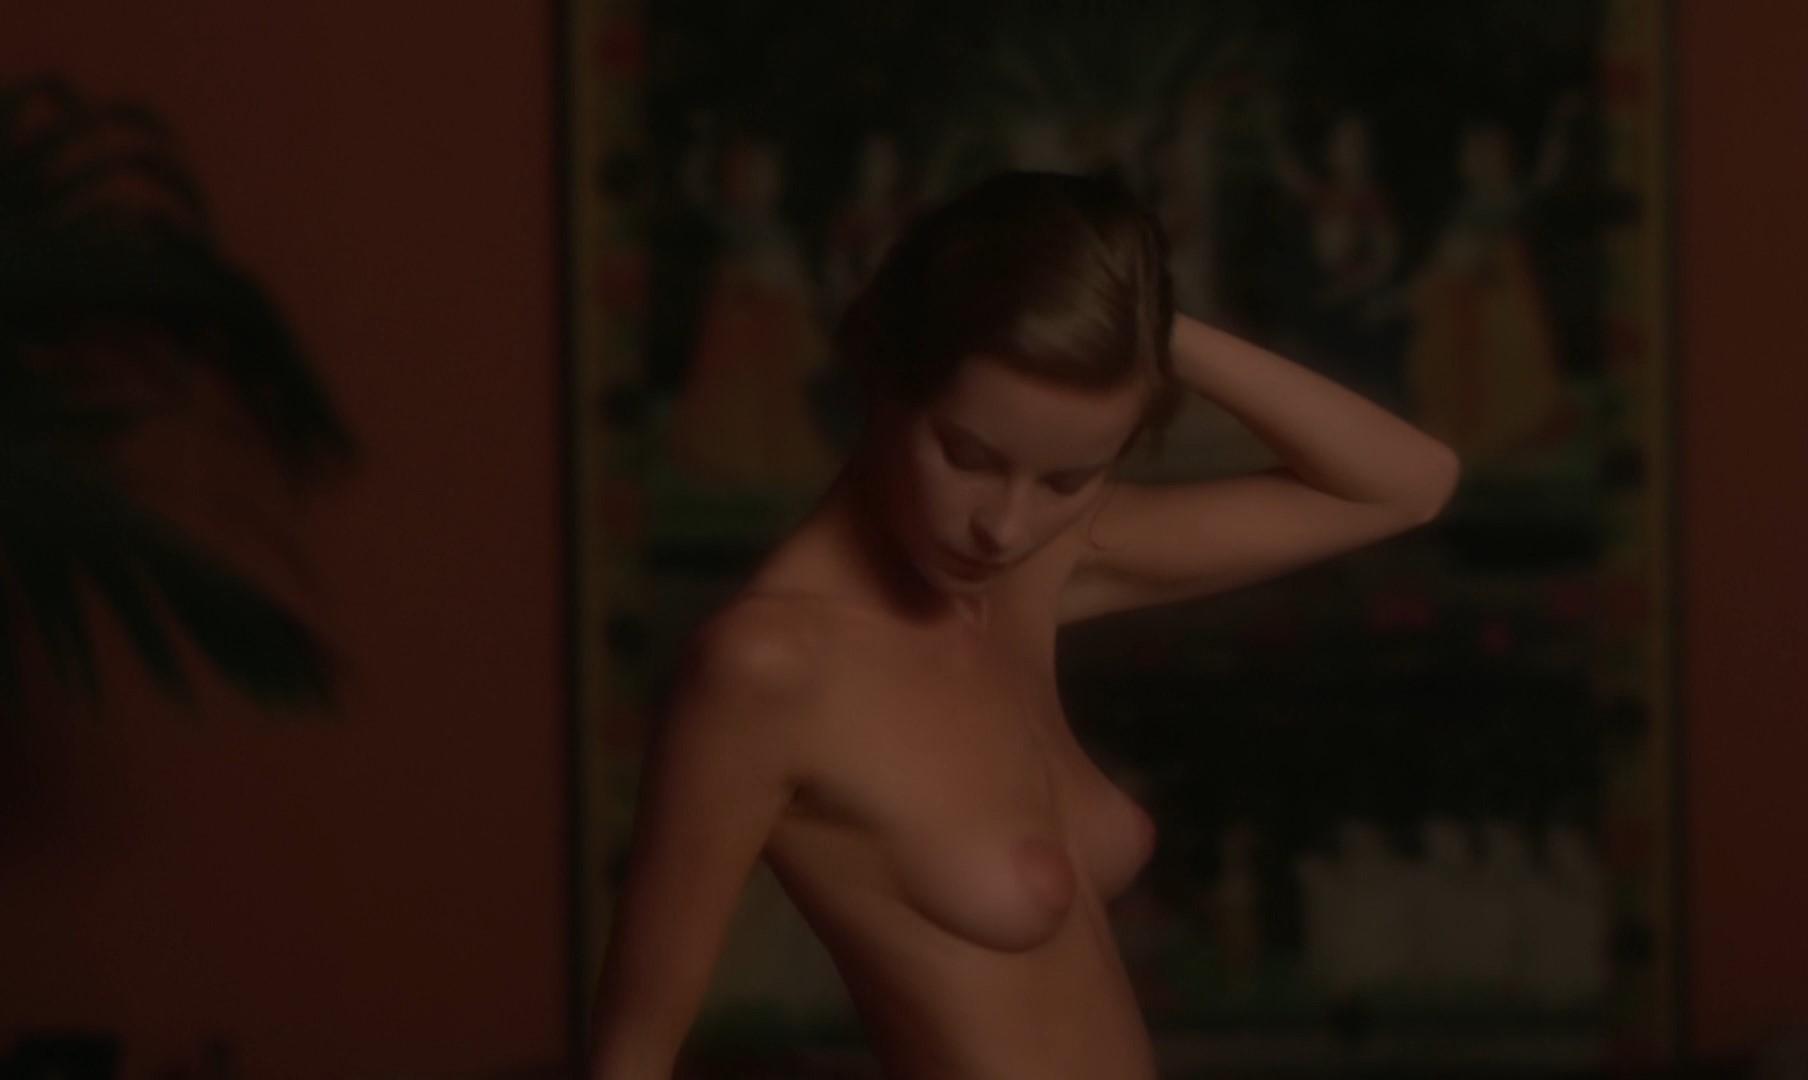 Selfie Porn Bebe Rexha naked photo 2017